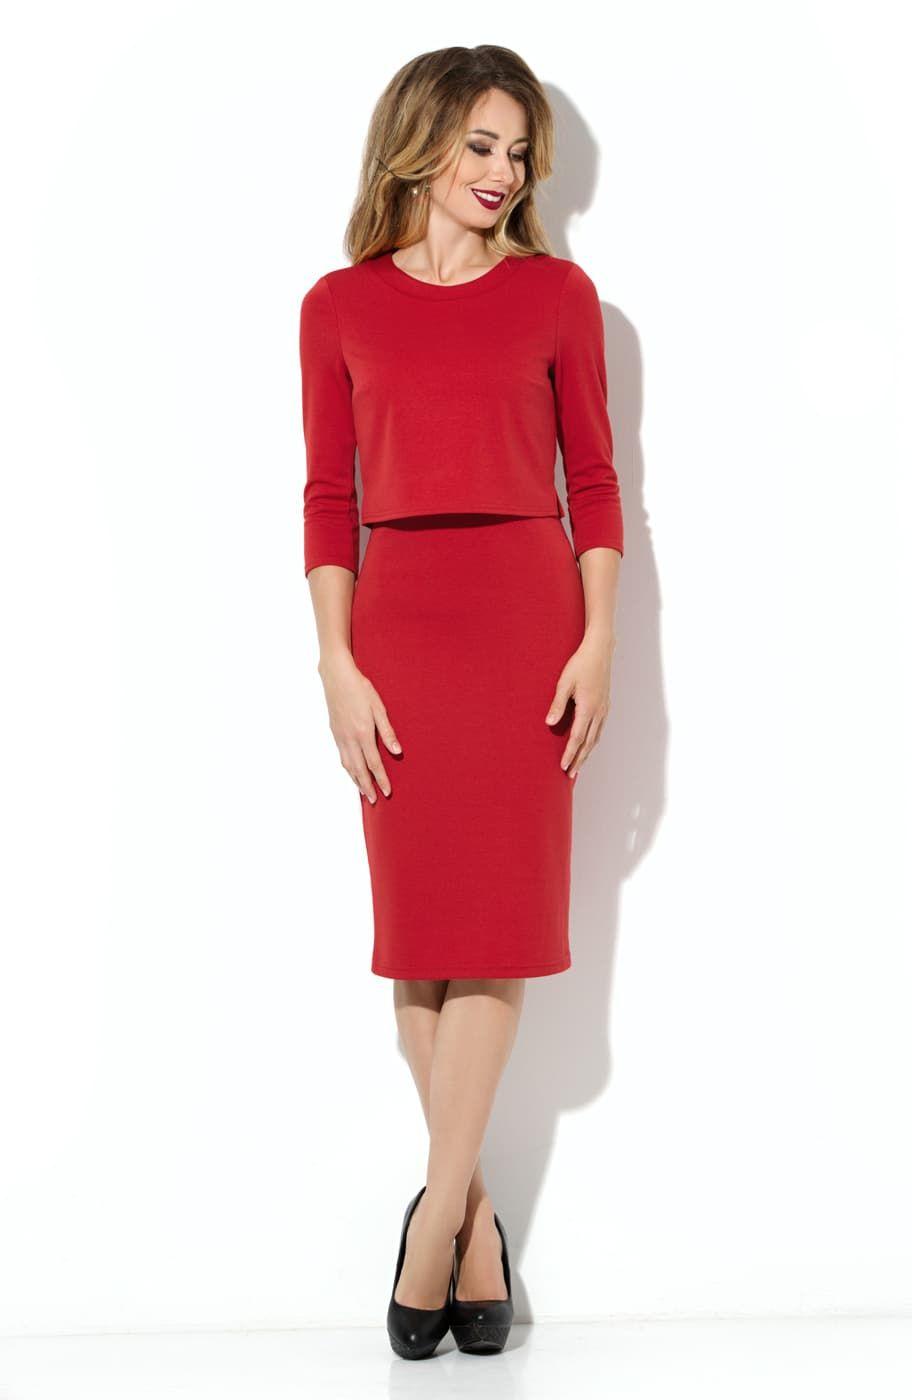 38a2cf2091e Платье из джерси Donna-Saggia DSP-75-29t от производителя